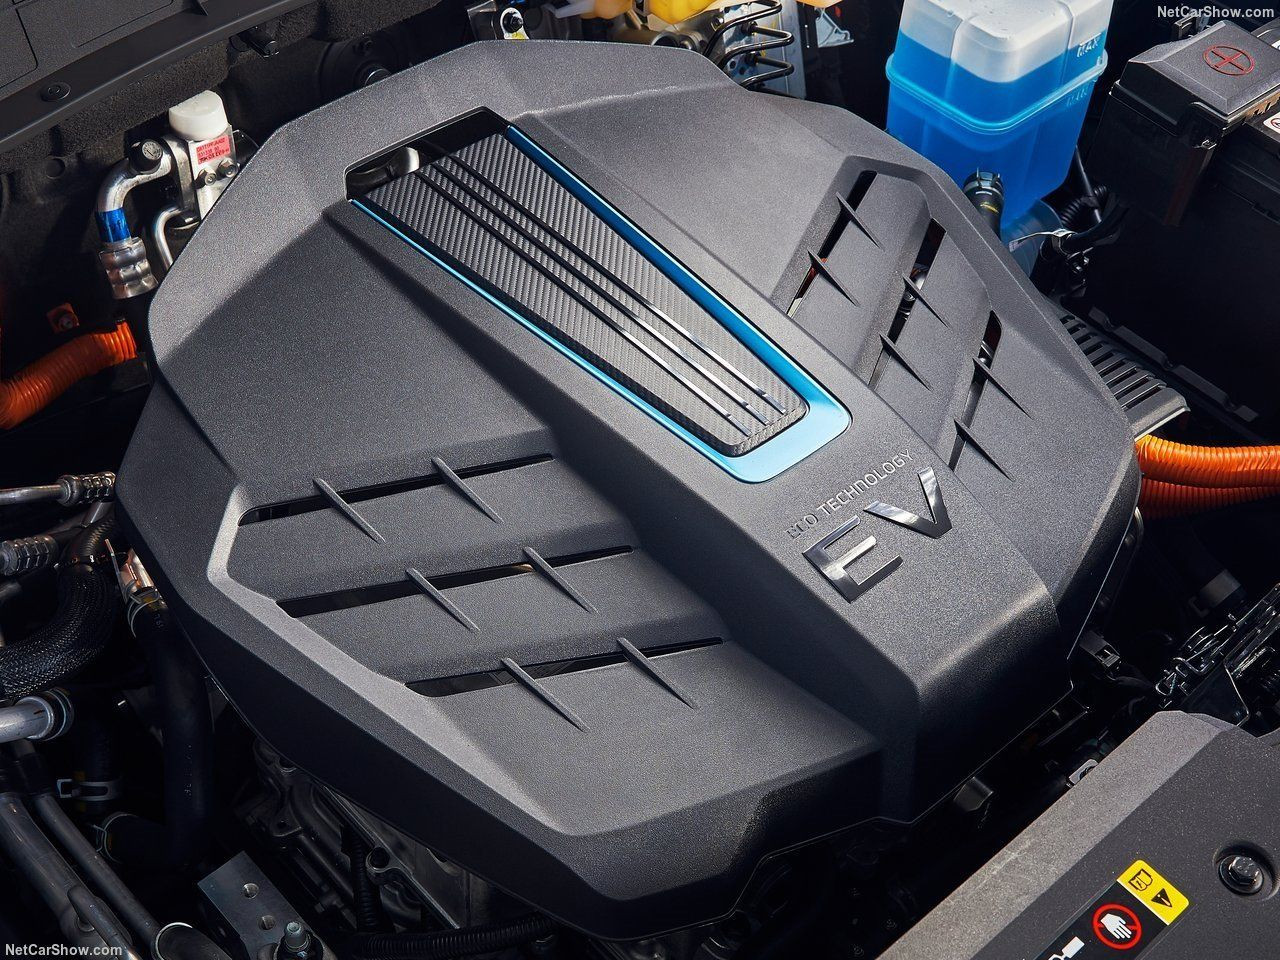 Hyundai'nin yeni elektrikli SUV'u Türkiye'de... İşte 2021 Hyundai Kona Electric - Resim: 3